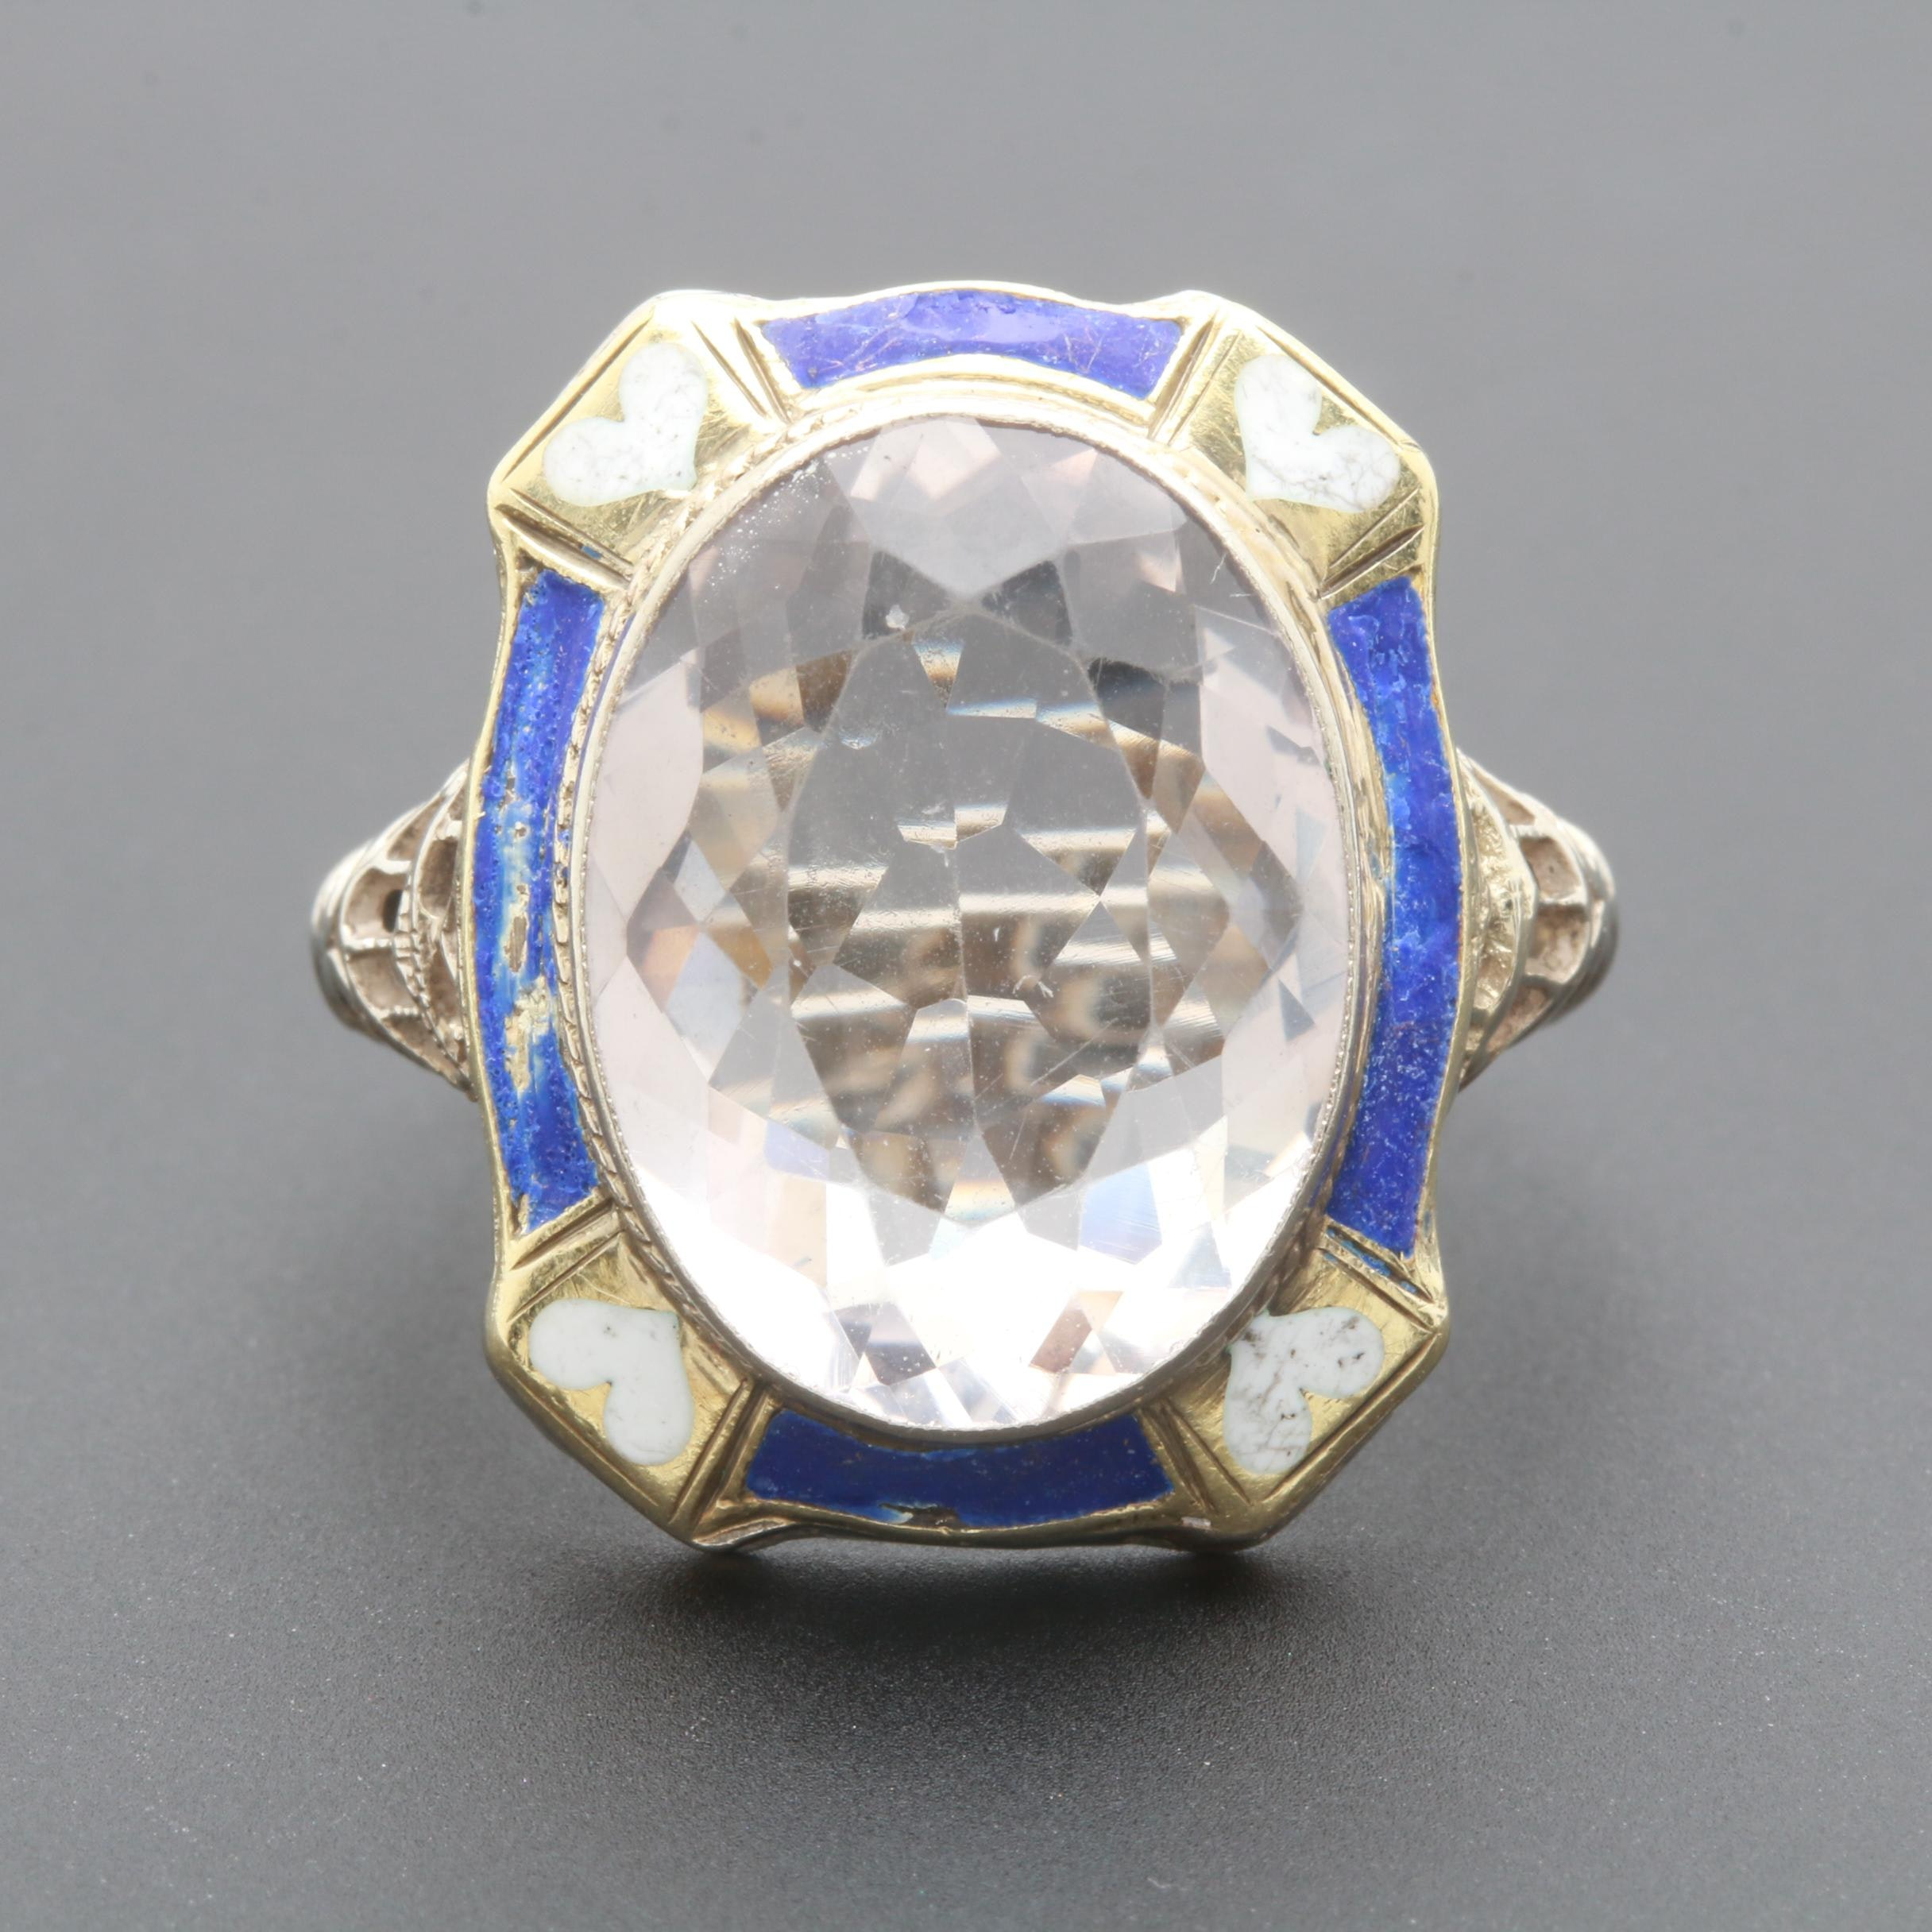 Circa 1930s 14K White Gold Clear Quartz and Enamel Ring